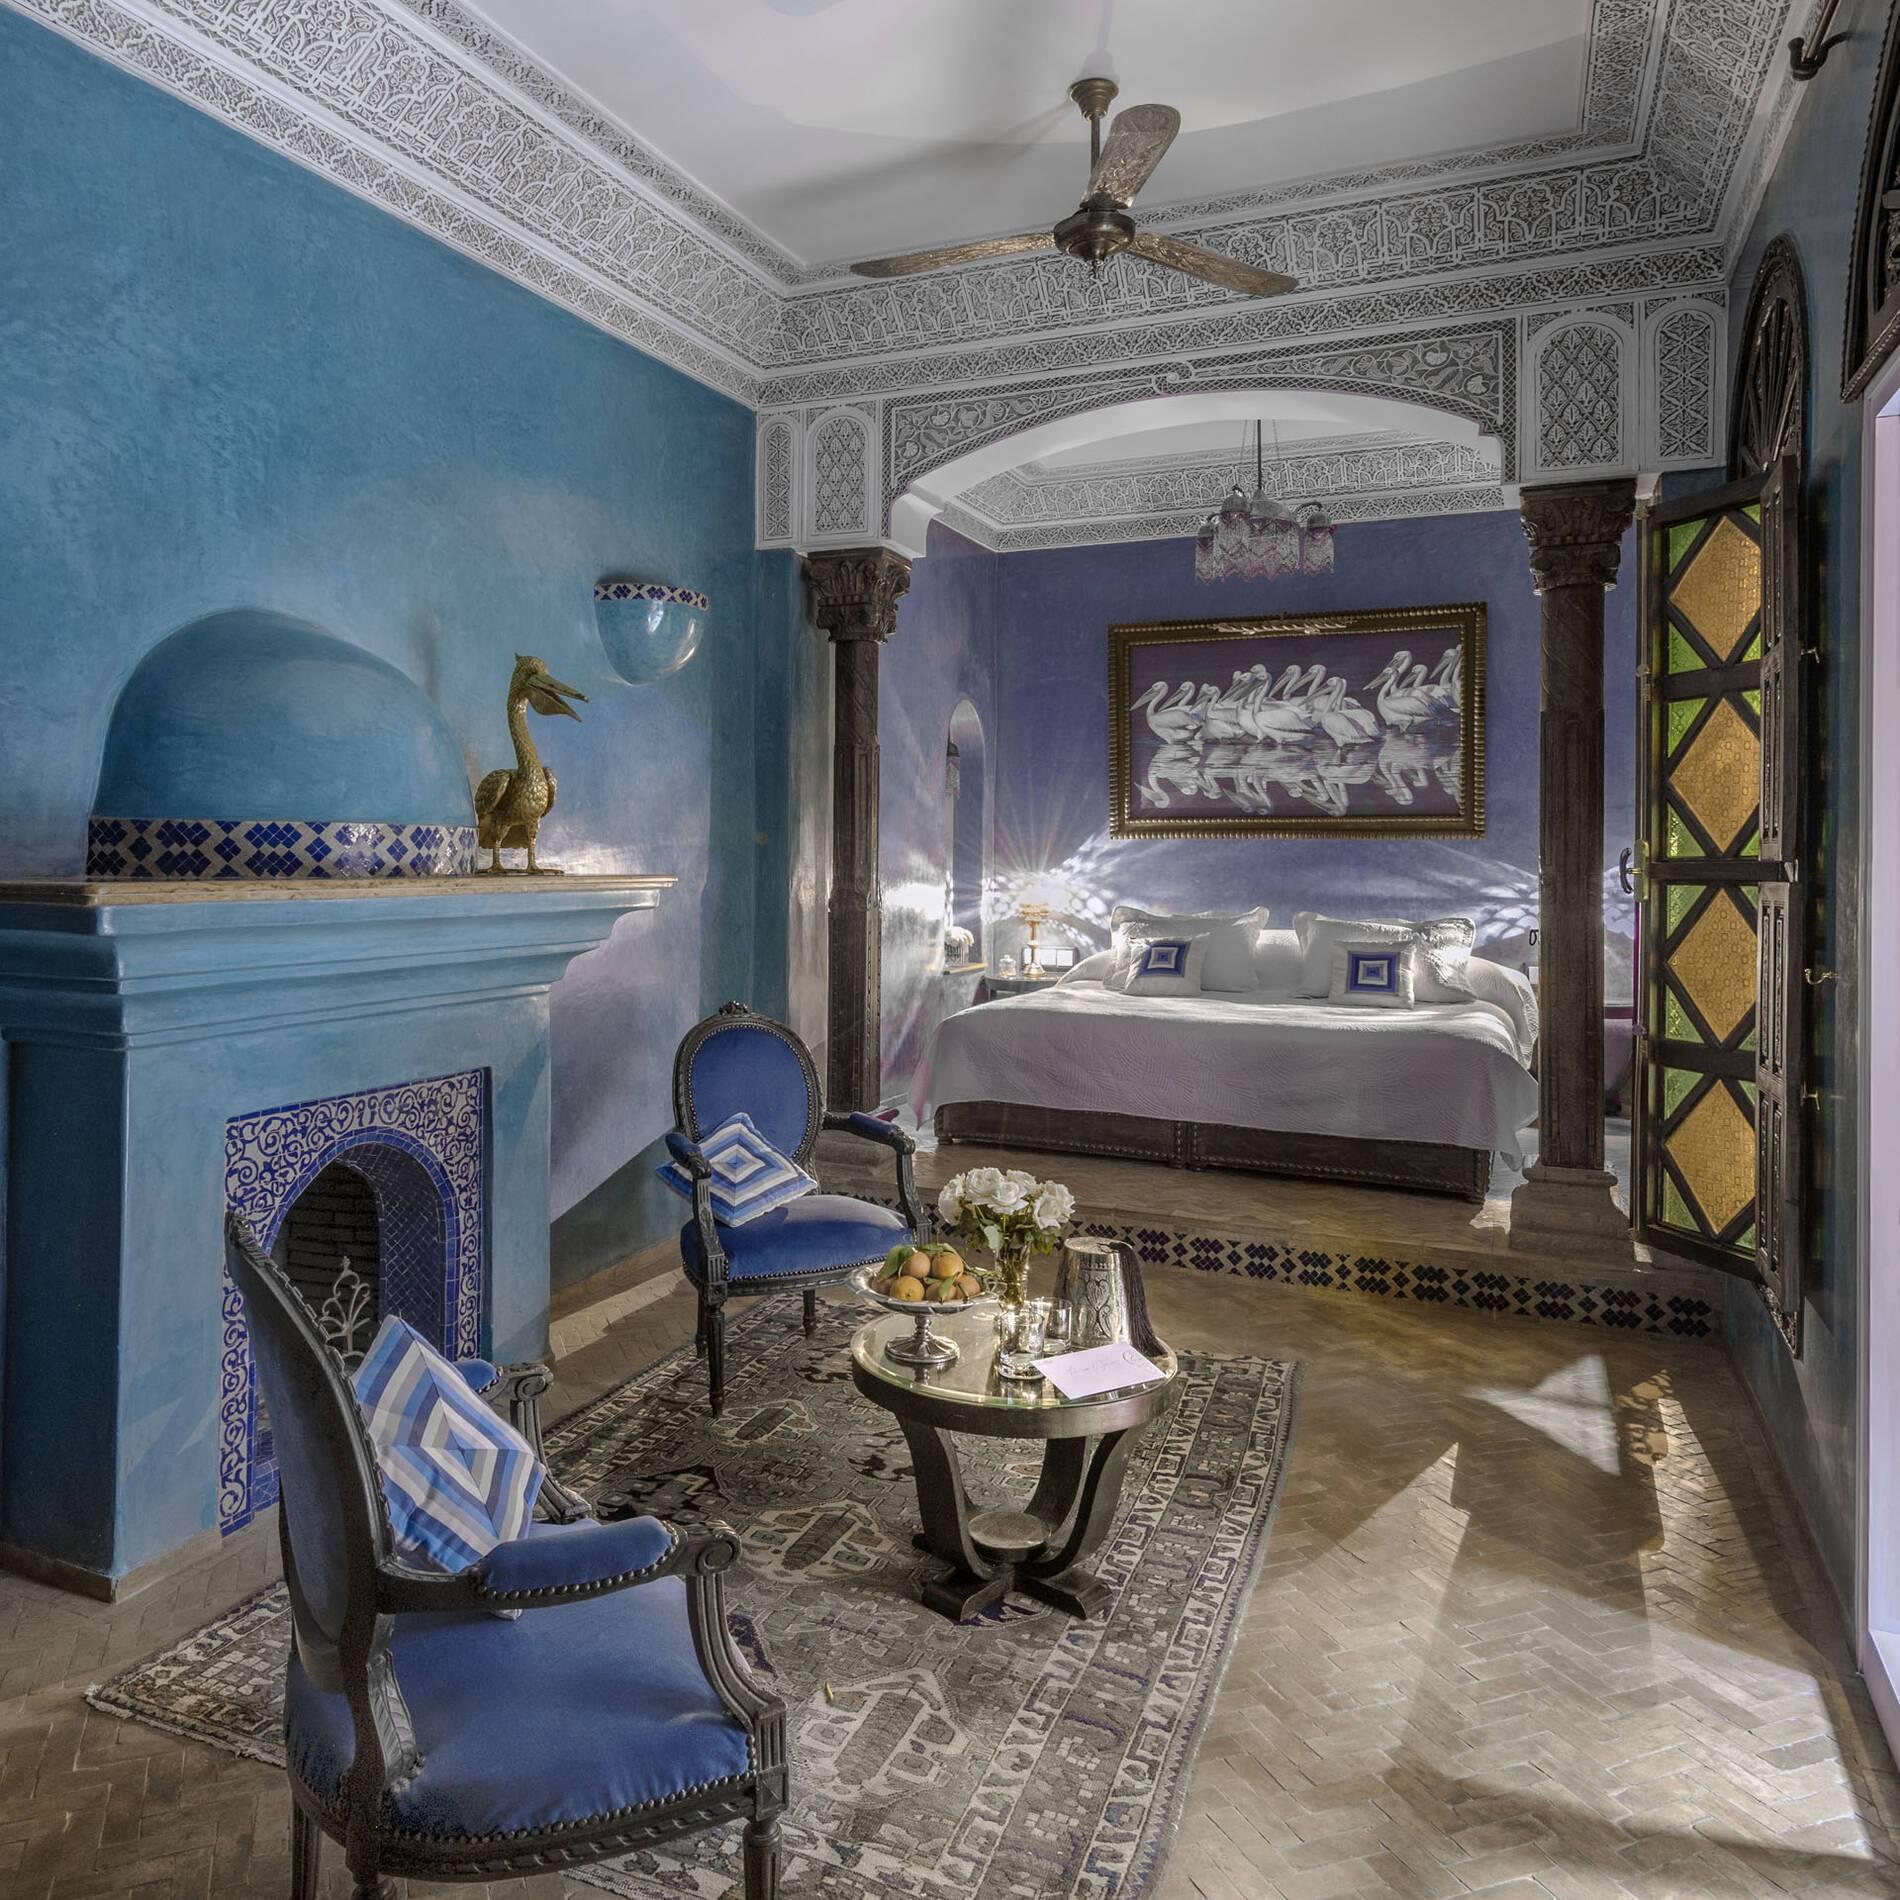 Sultana Marrakech Riad Room